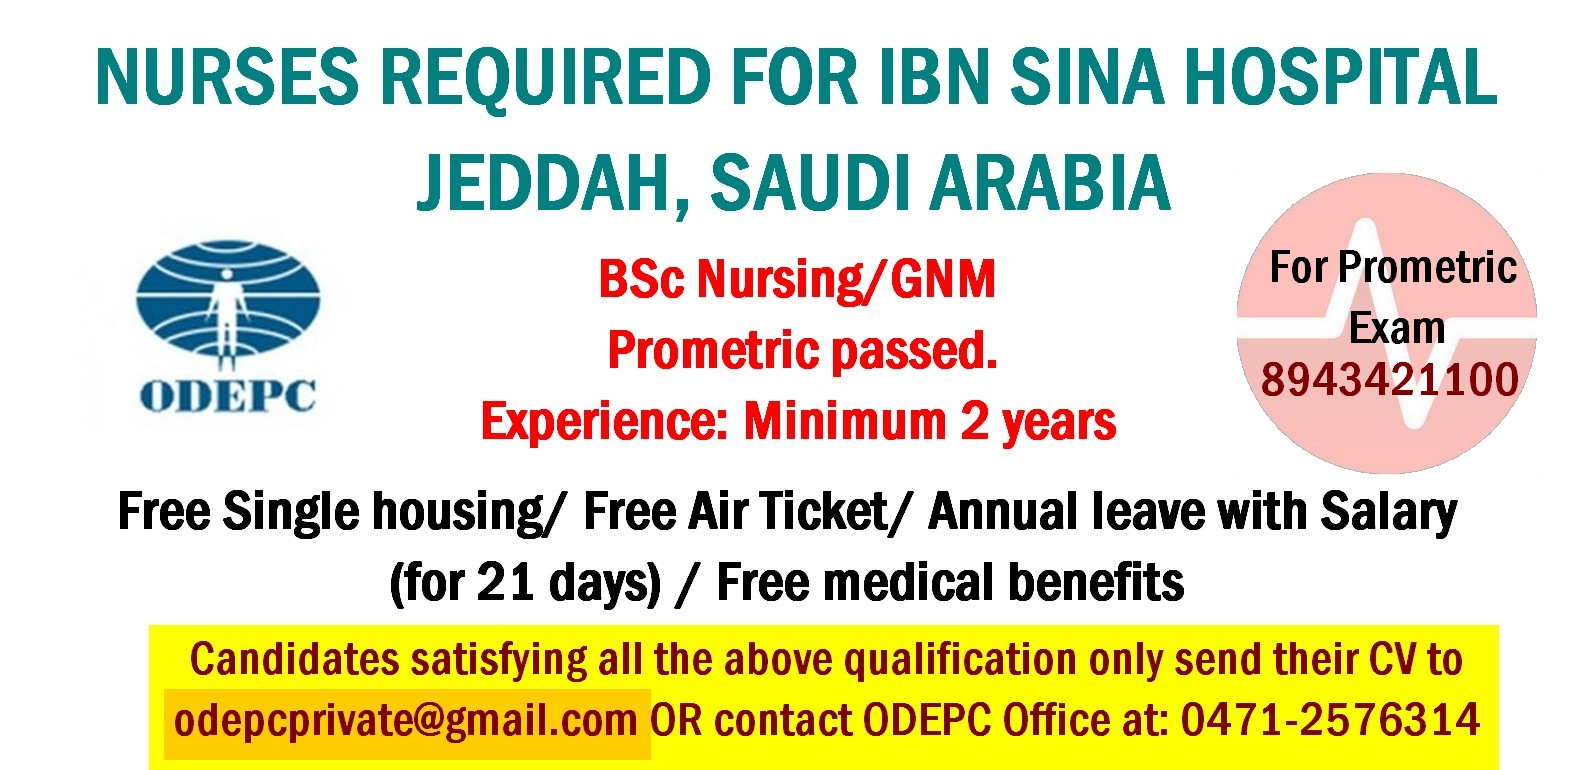 Nurses Job Vacancy Nurses Required For Ibn Sina Hospital Jeddah Saudi Arabia